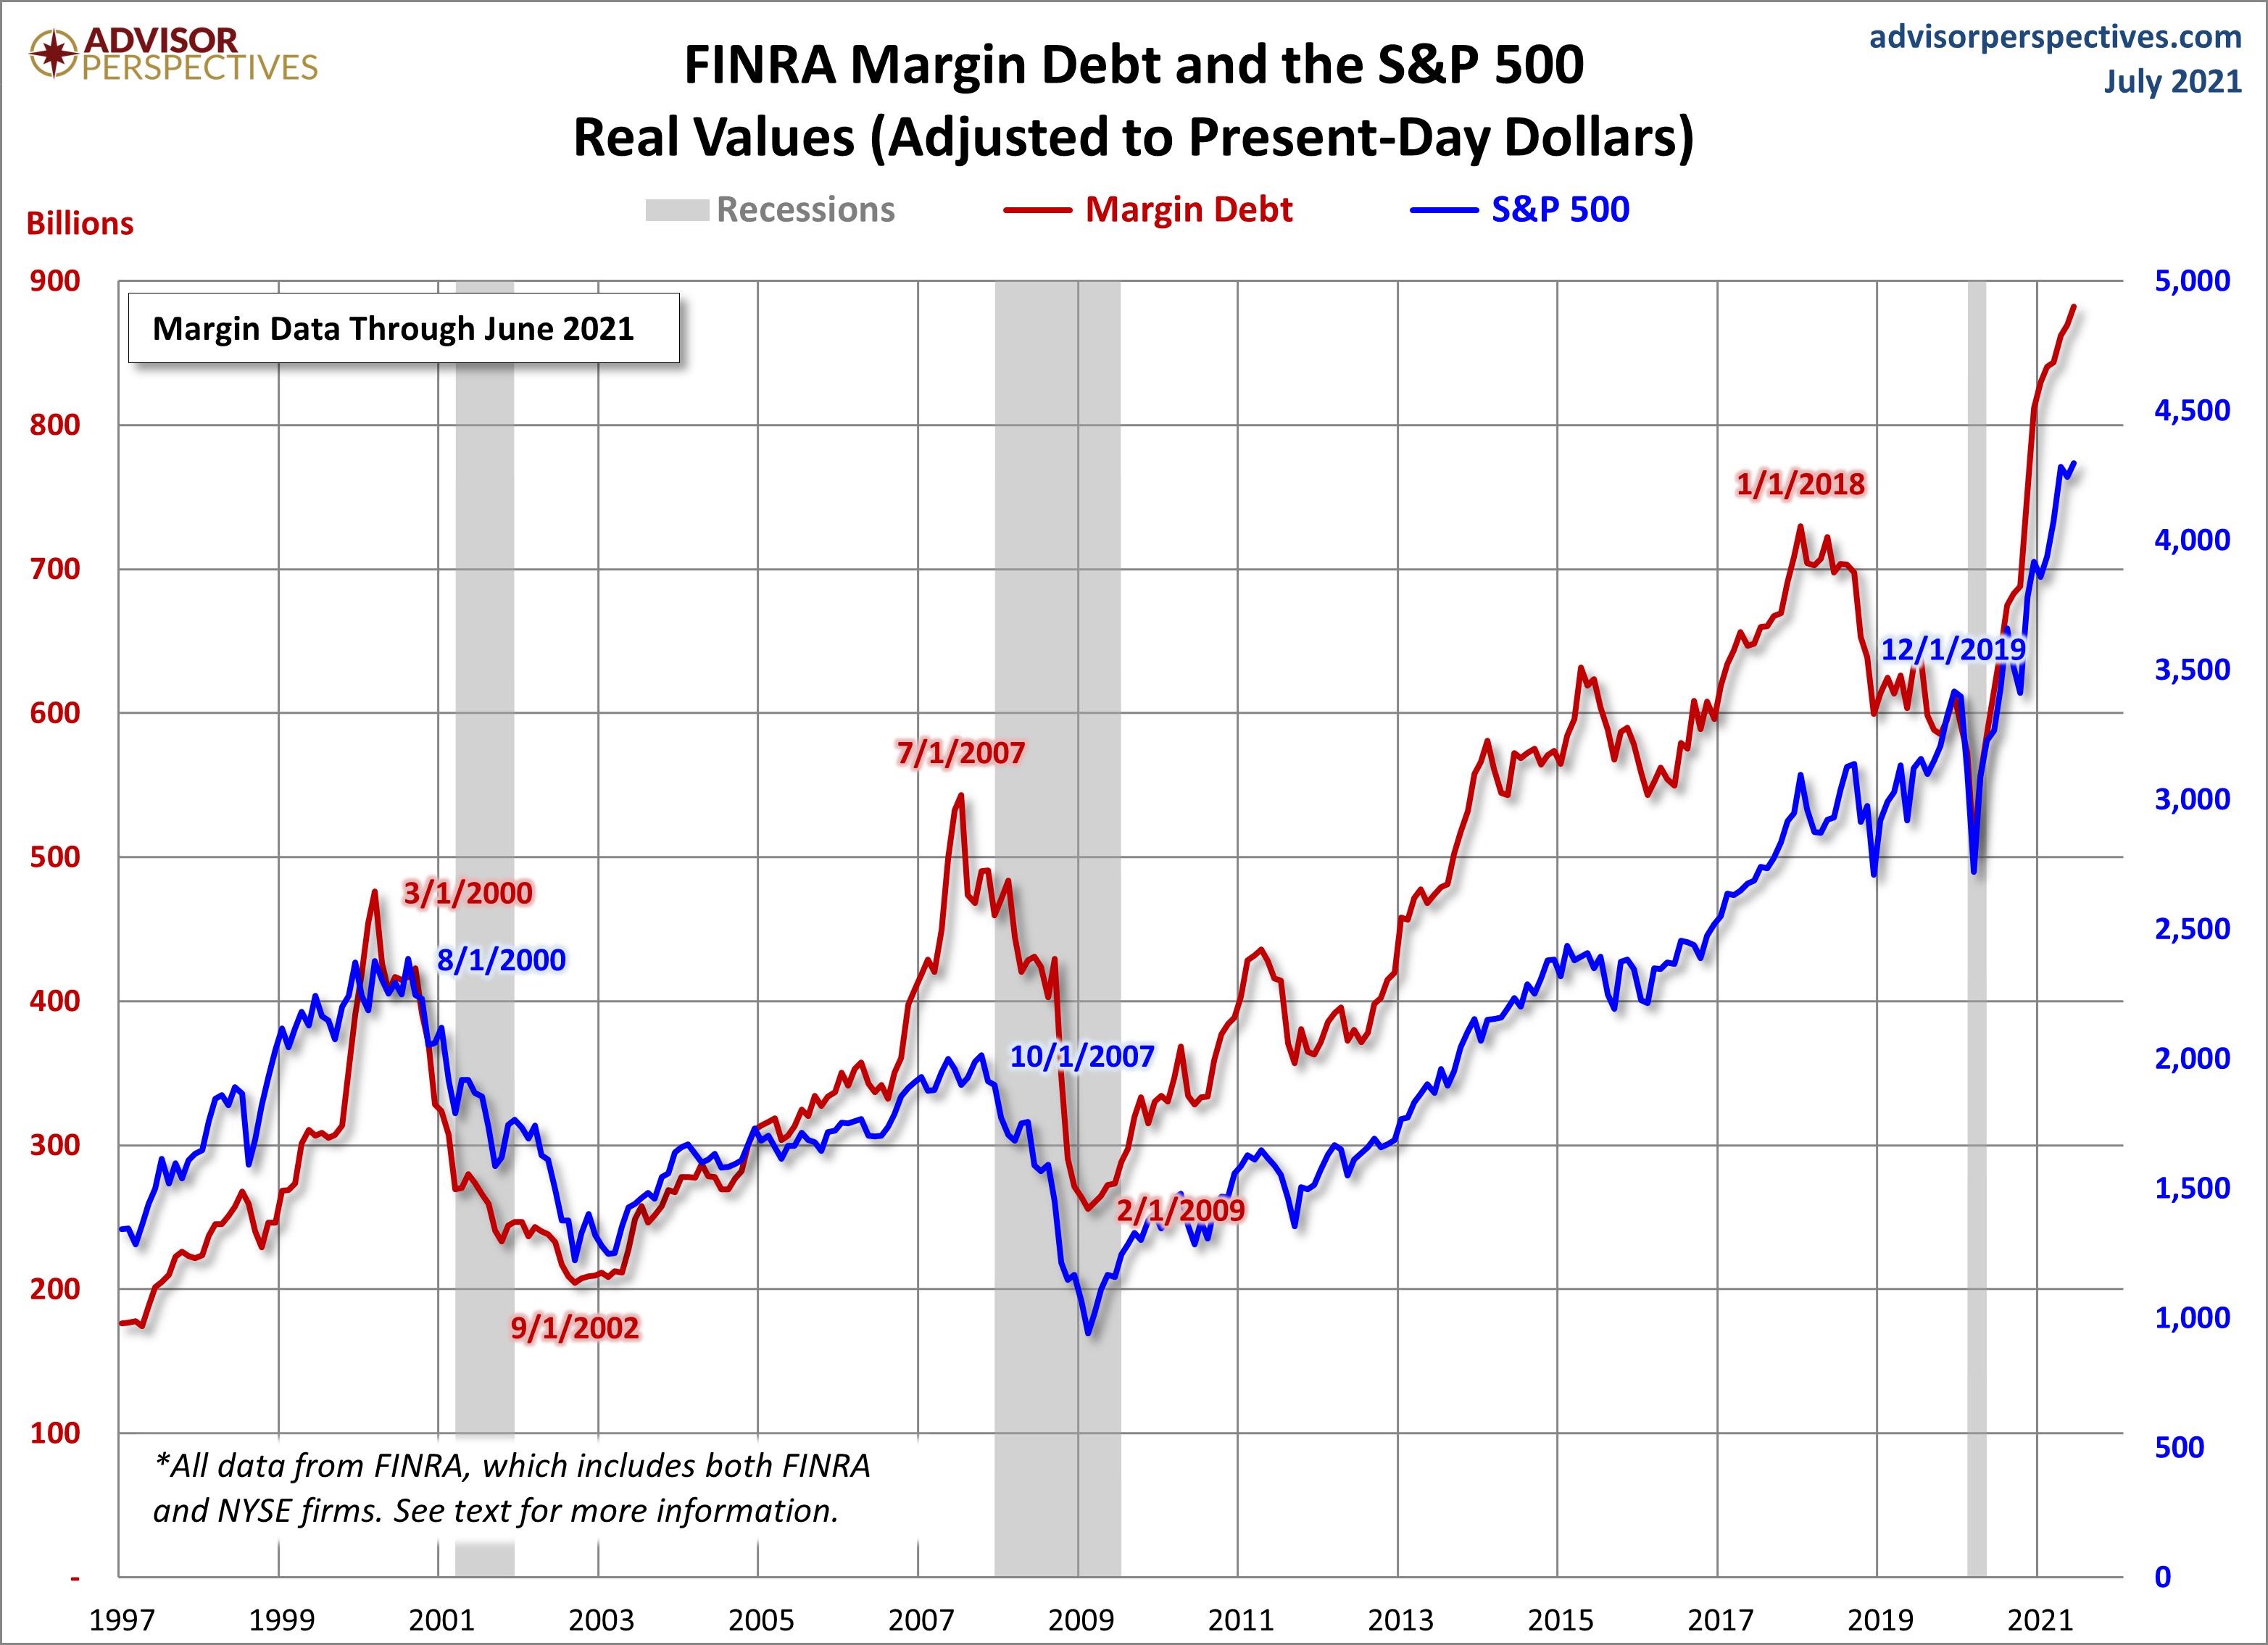 Margin Debt